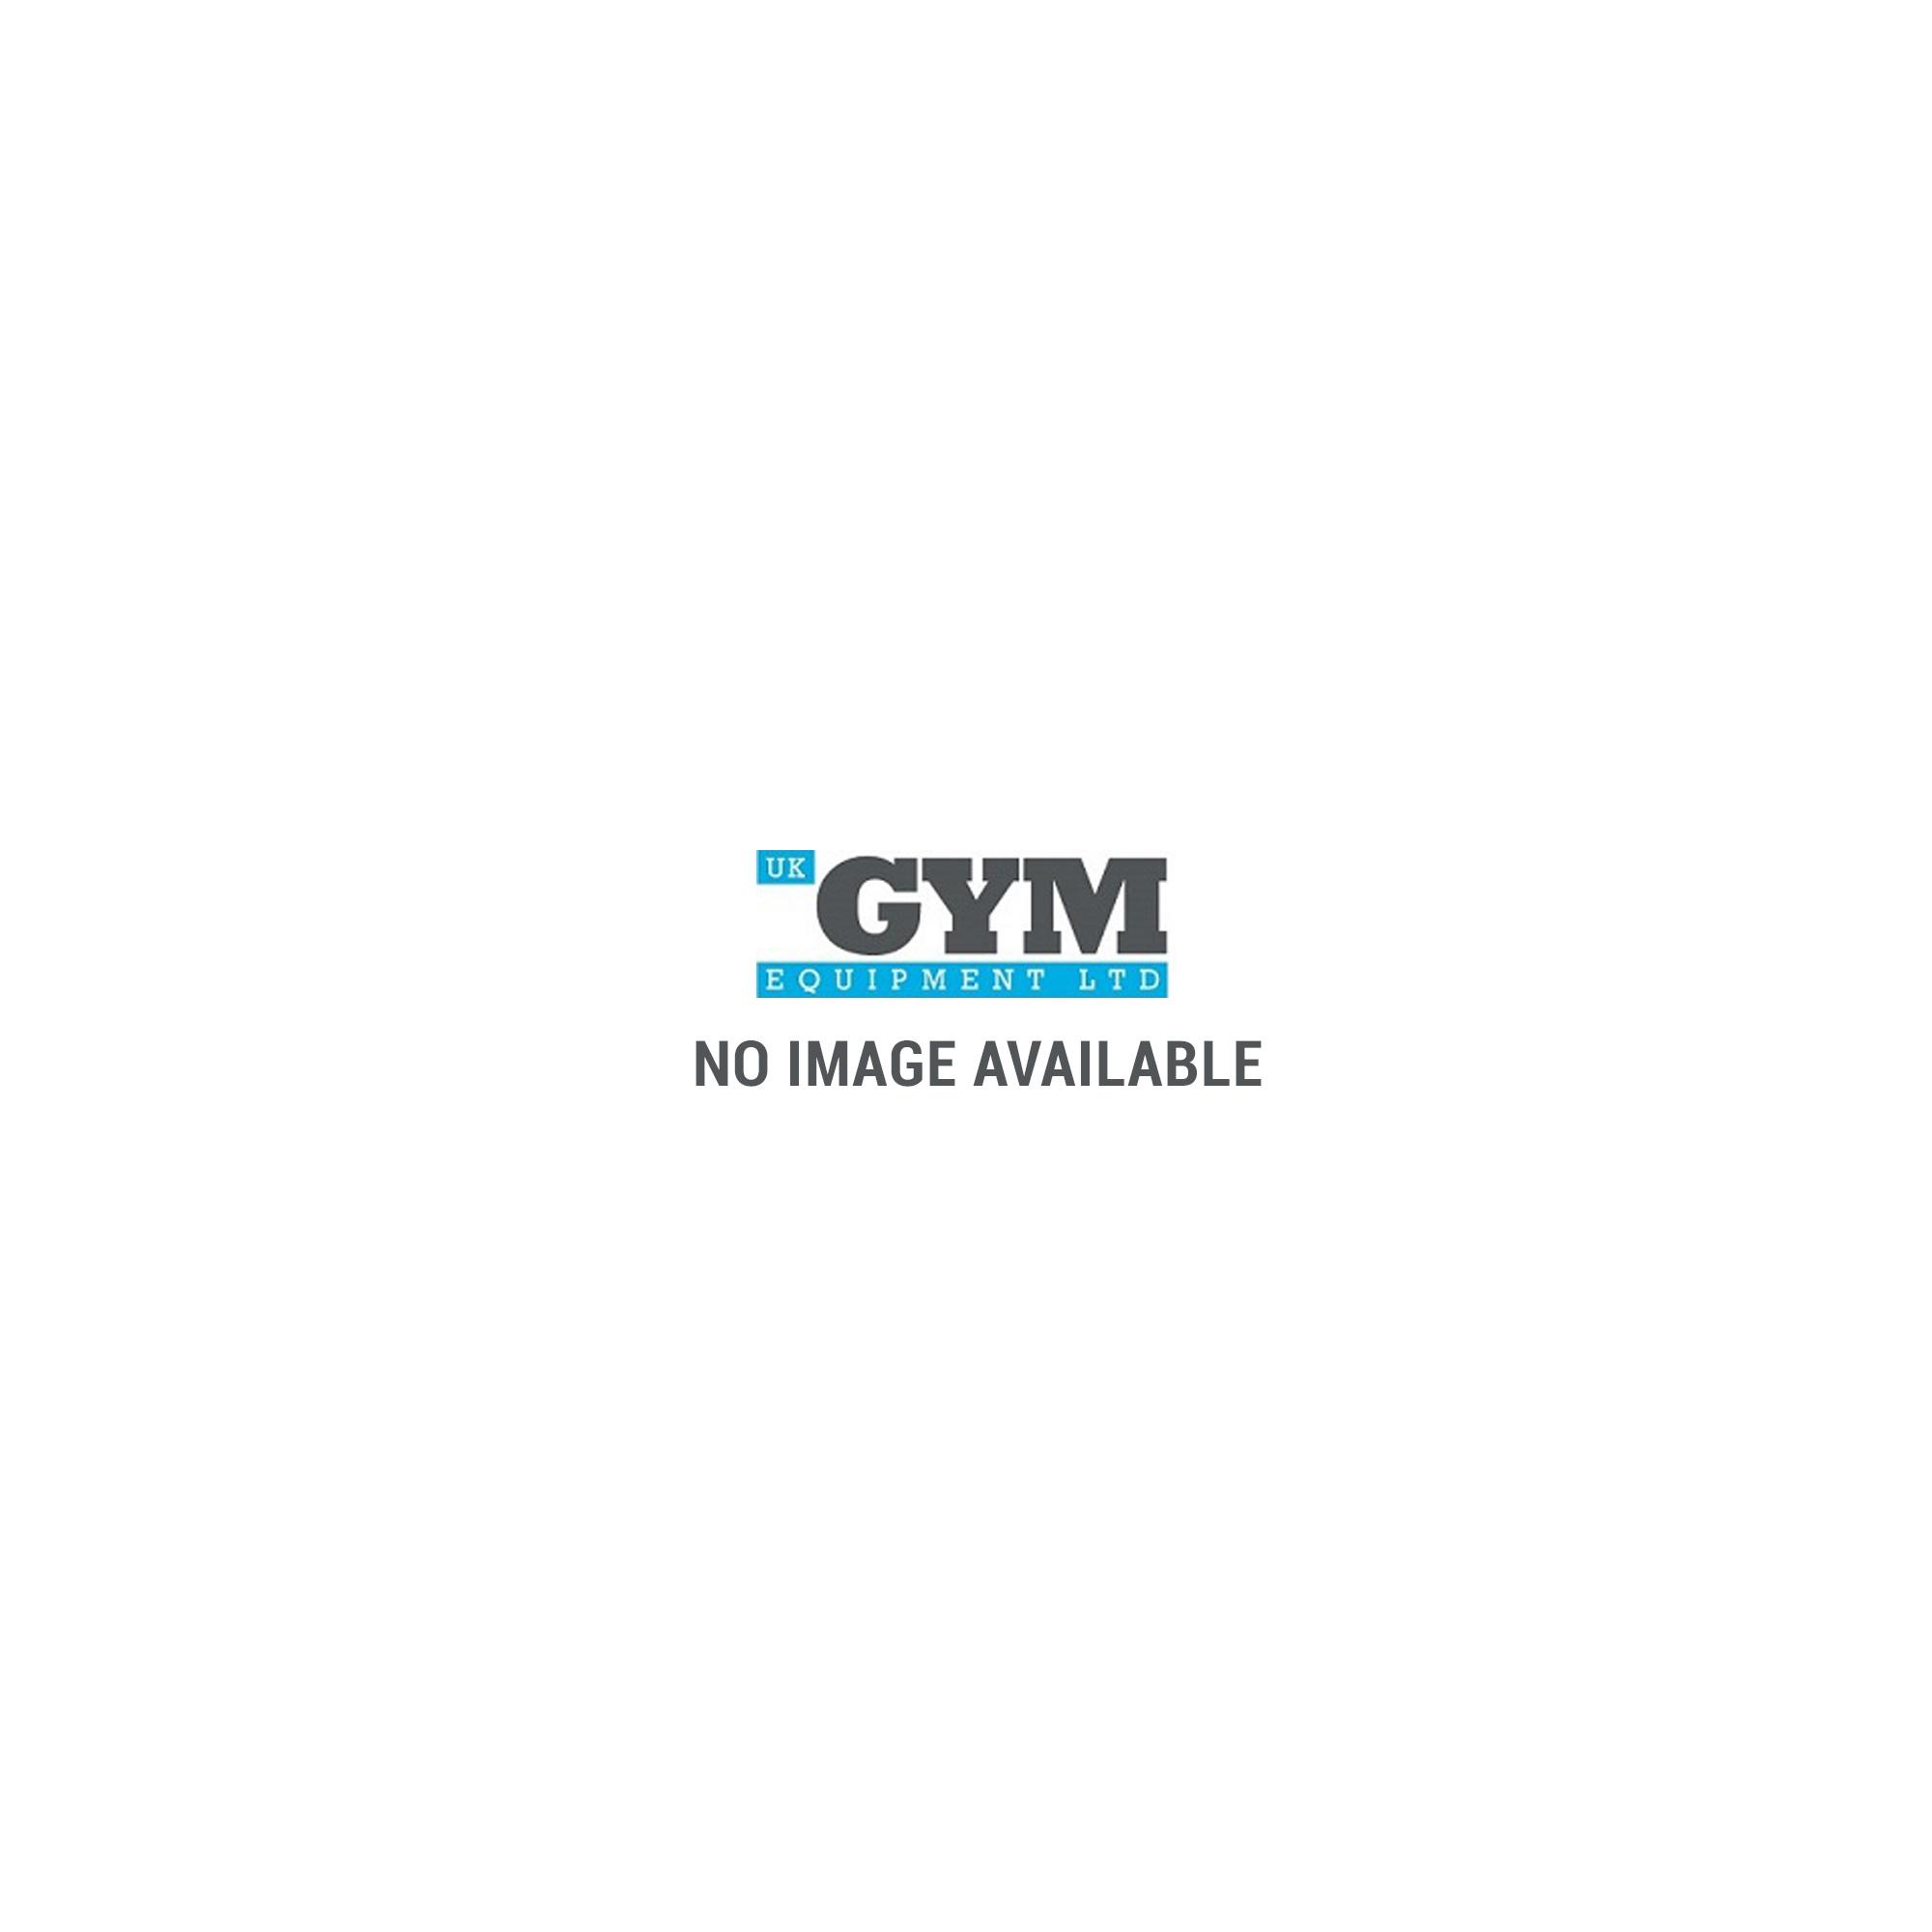 Cardio Machines From UK Gym